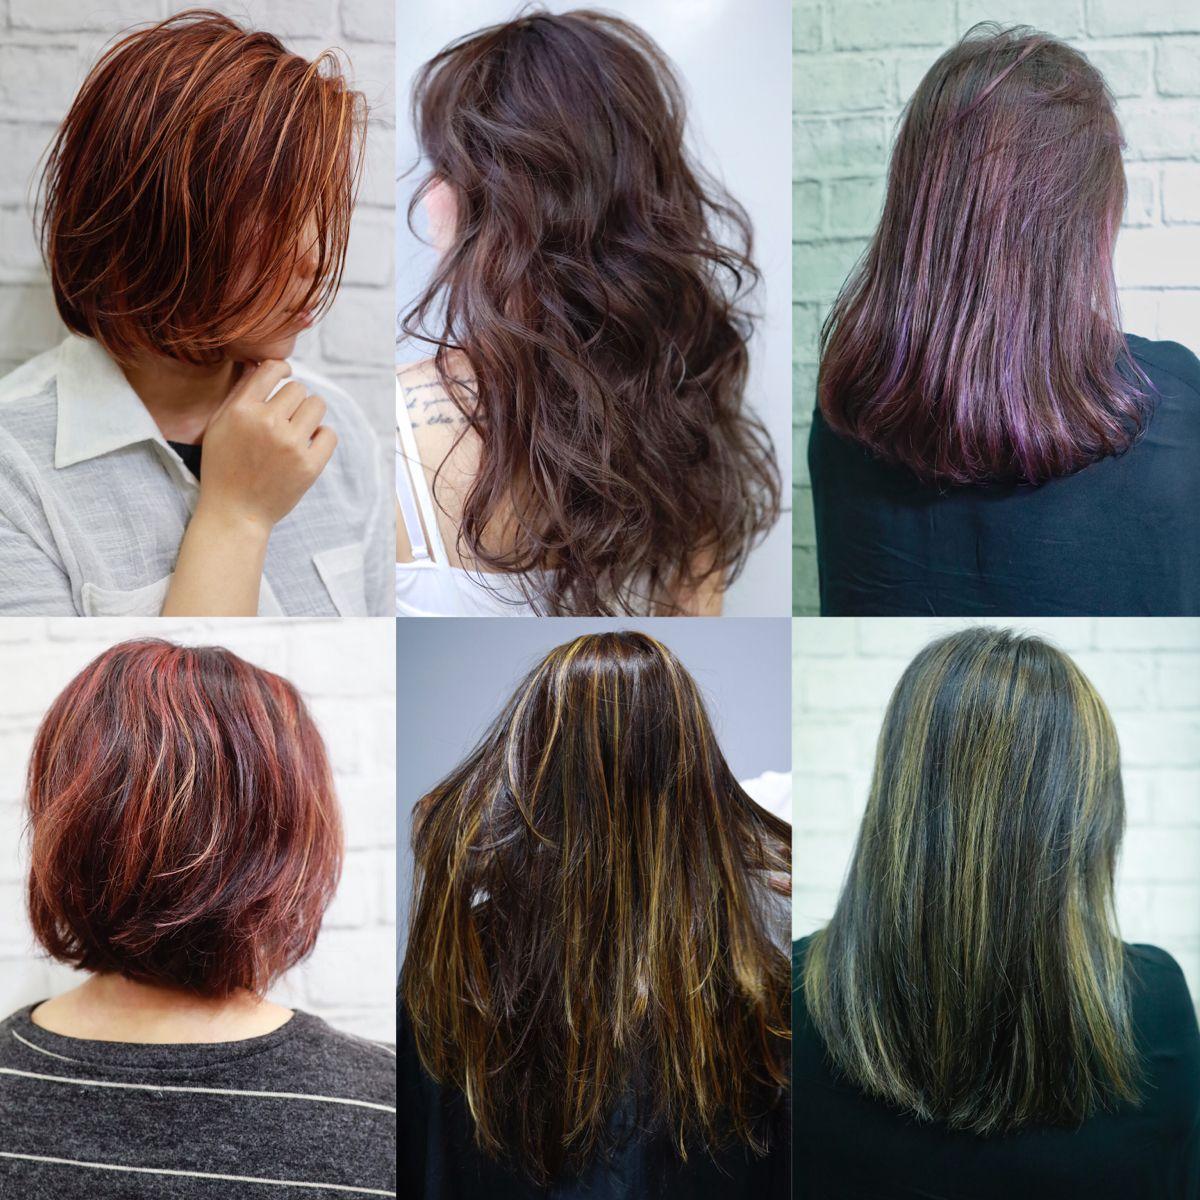 Pin by 柔 伊 on ECO COLOR MAGIC 彩魔  Long hair styles, Hair